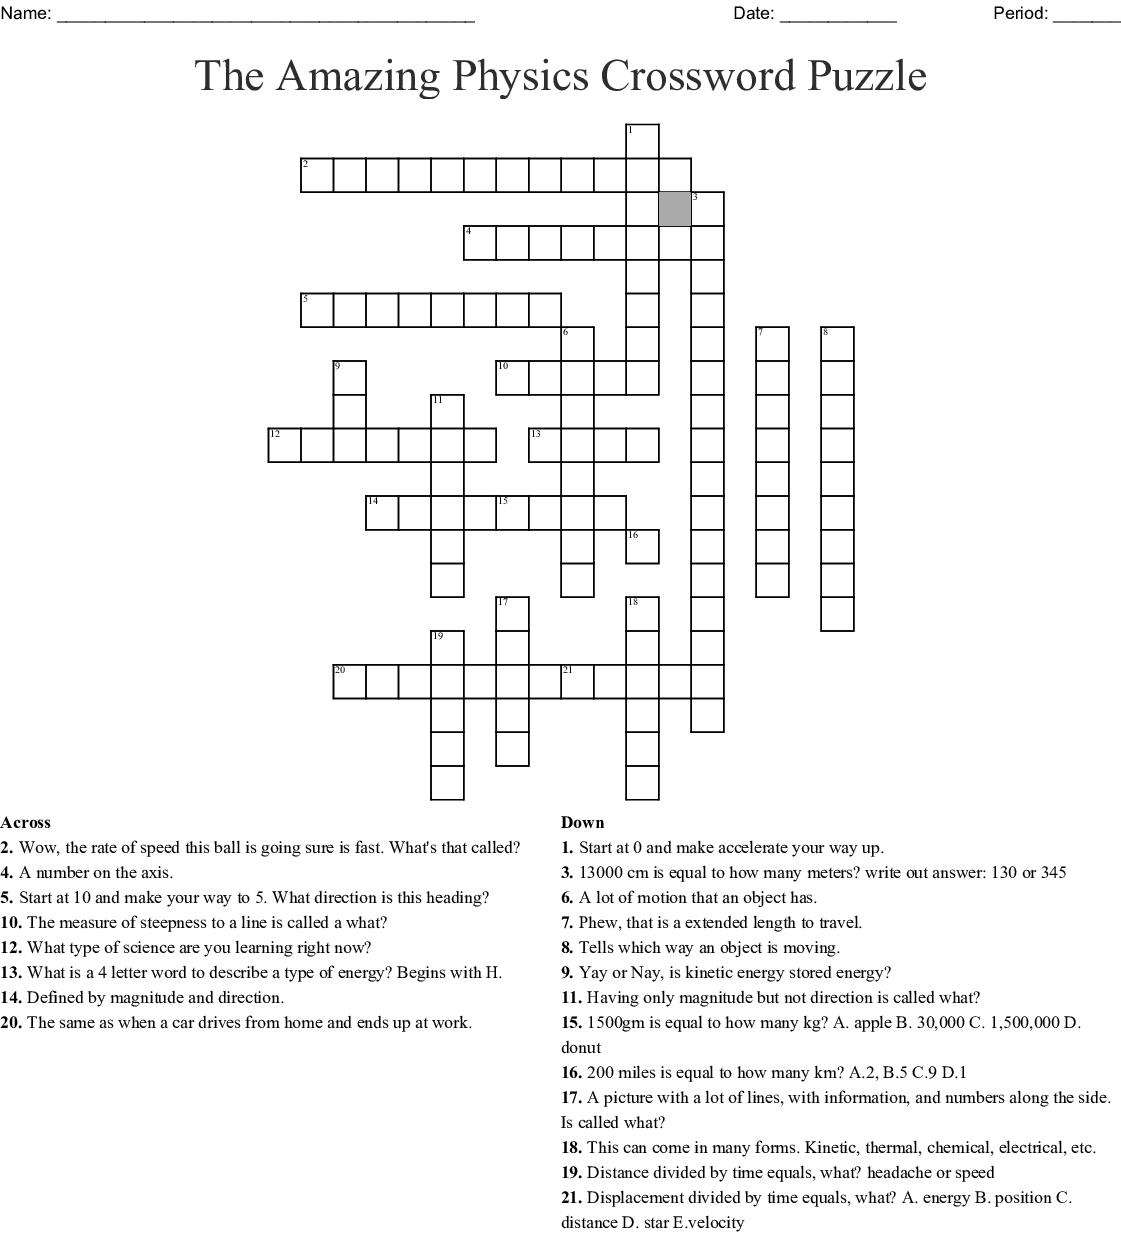 The Amazing Physics Crossword Puzzle Crossword - Wordmint - Physics Crossword Puzzles Printable With Answers